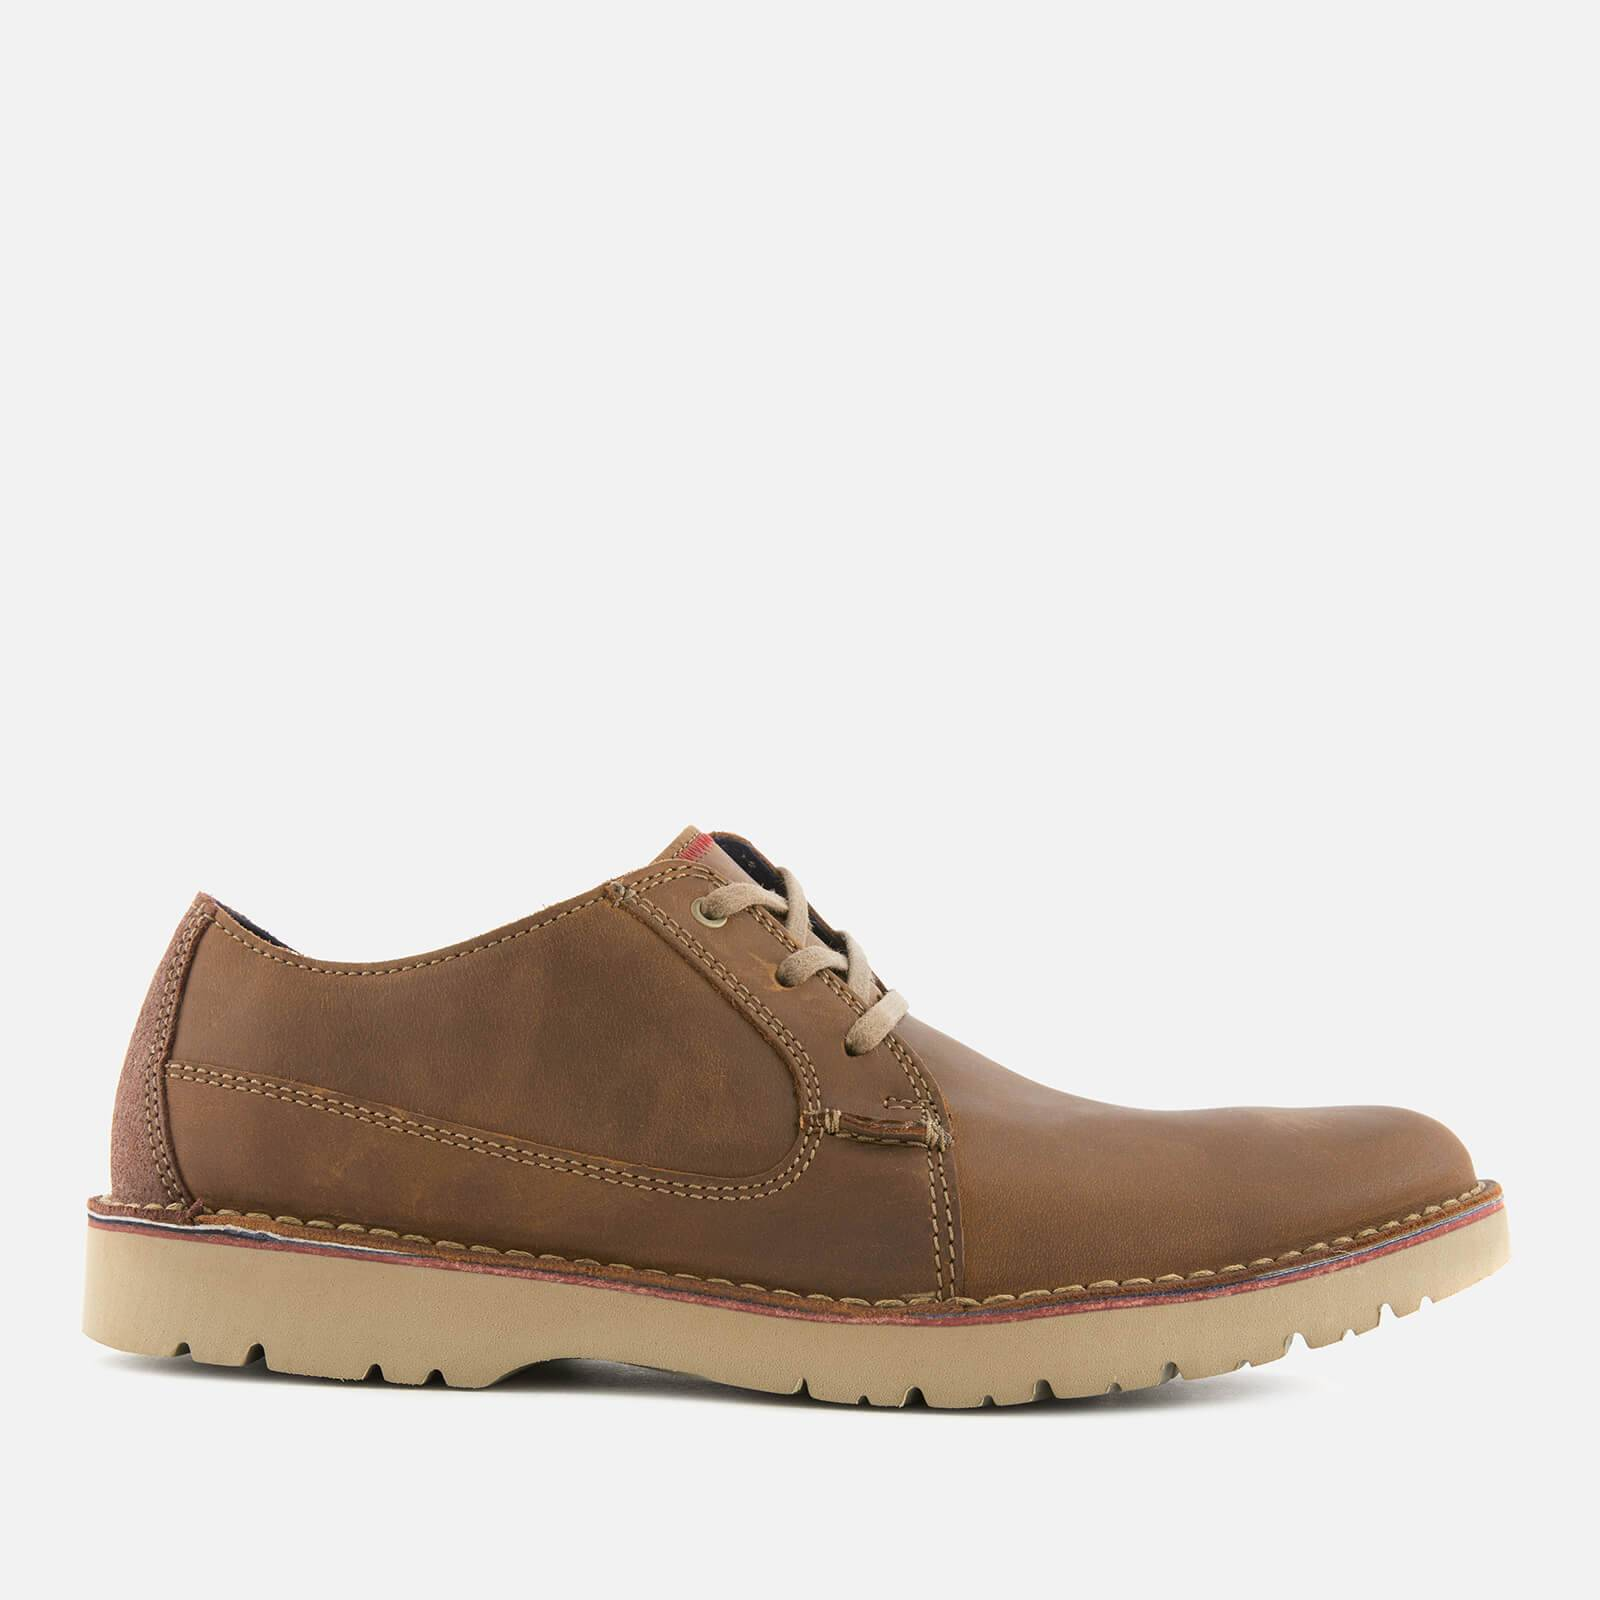 Clarks Men's Vargo Plain Leather Derby Shoes - Dark Tan - UK 11